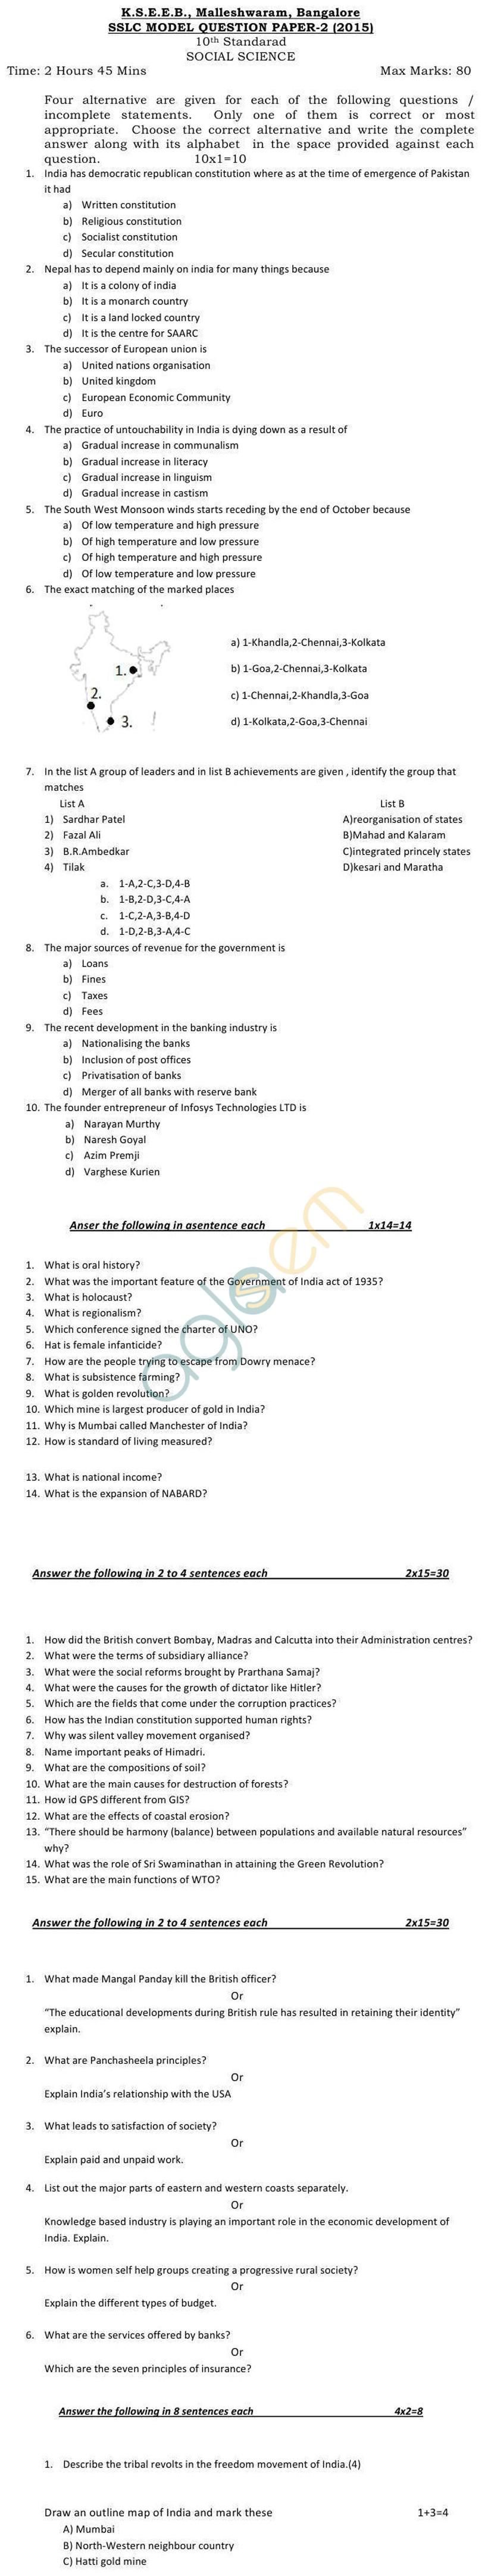 Karnataka Board SSLC Model Question Papers 2015 forSocial Science